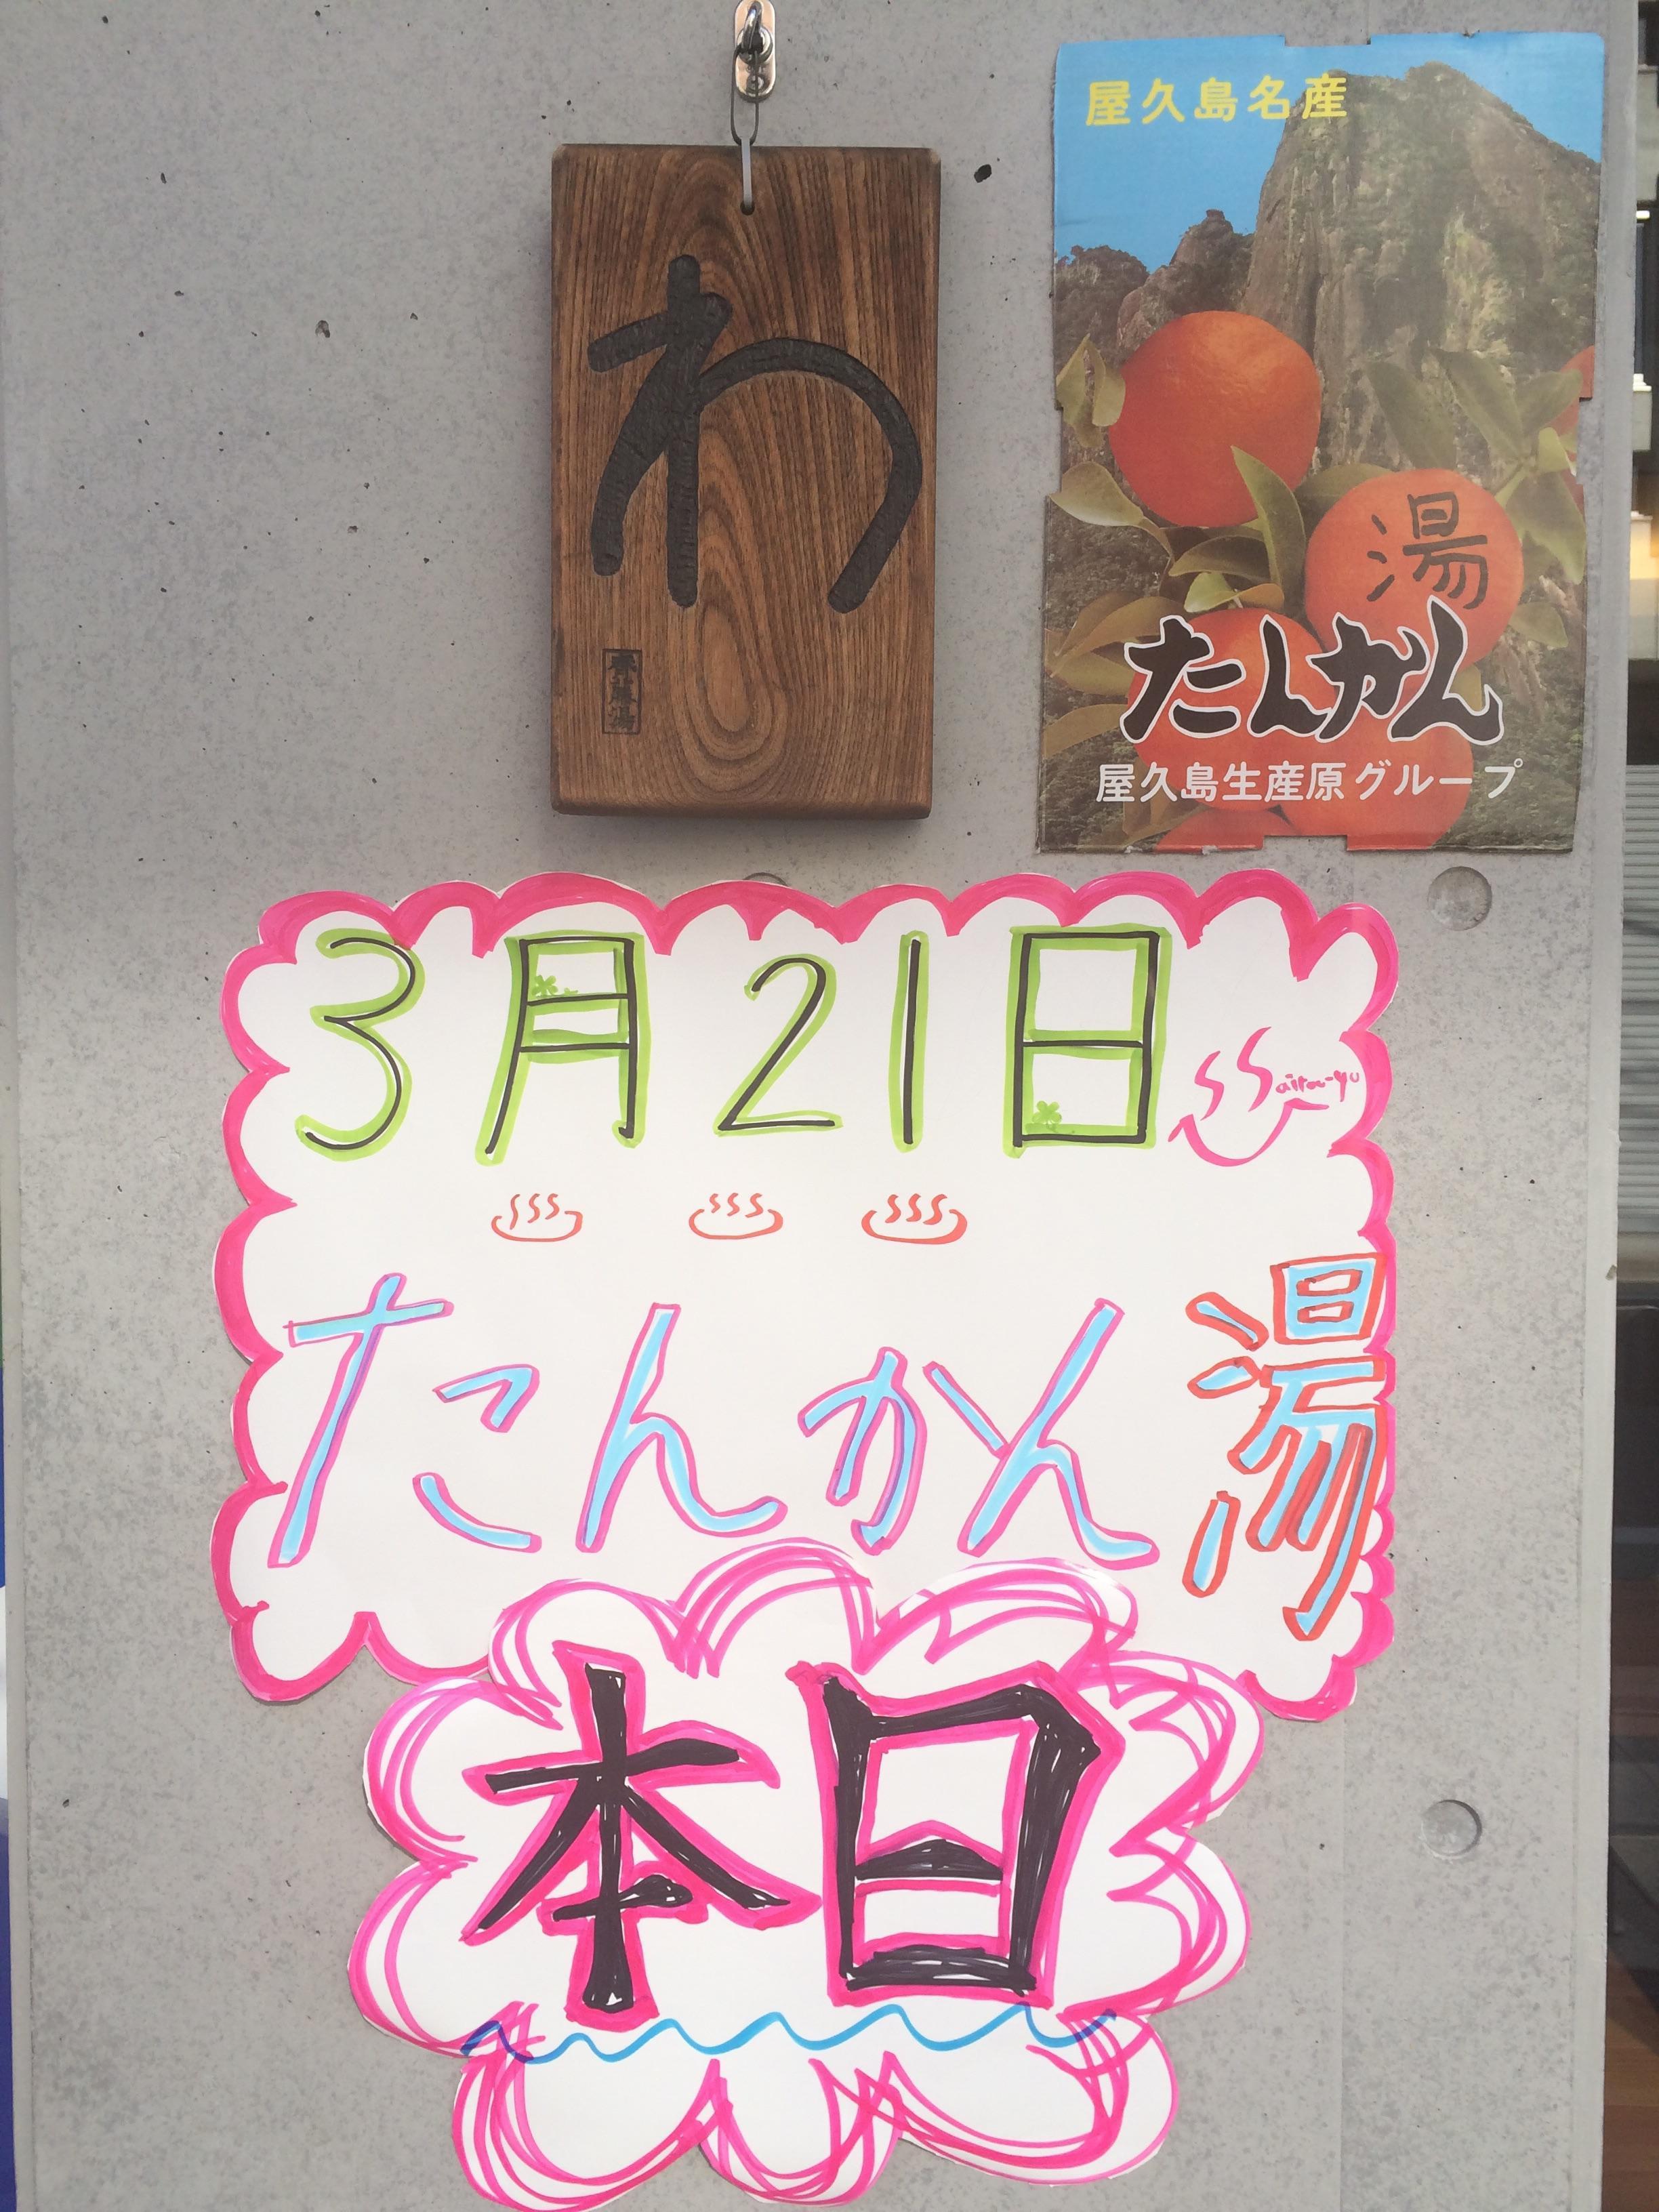 http://www.saito-yu.com/blog/e03bf06a5108582b2f18c9cd3aa1a59b8659a9a6.jpg